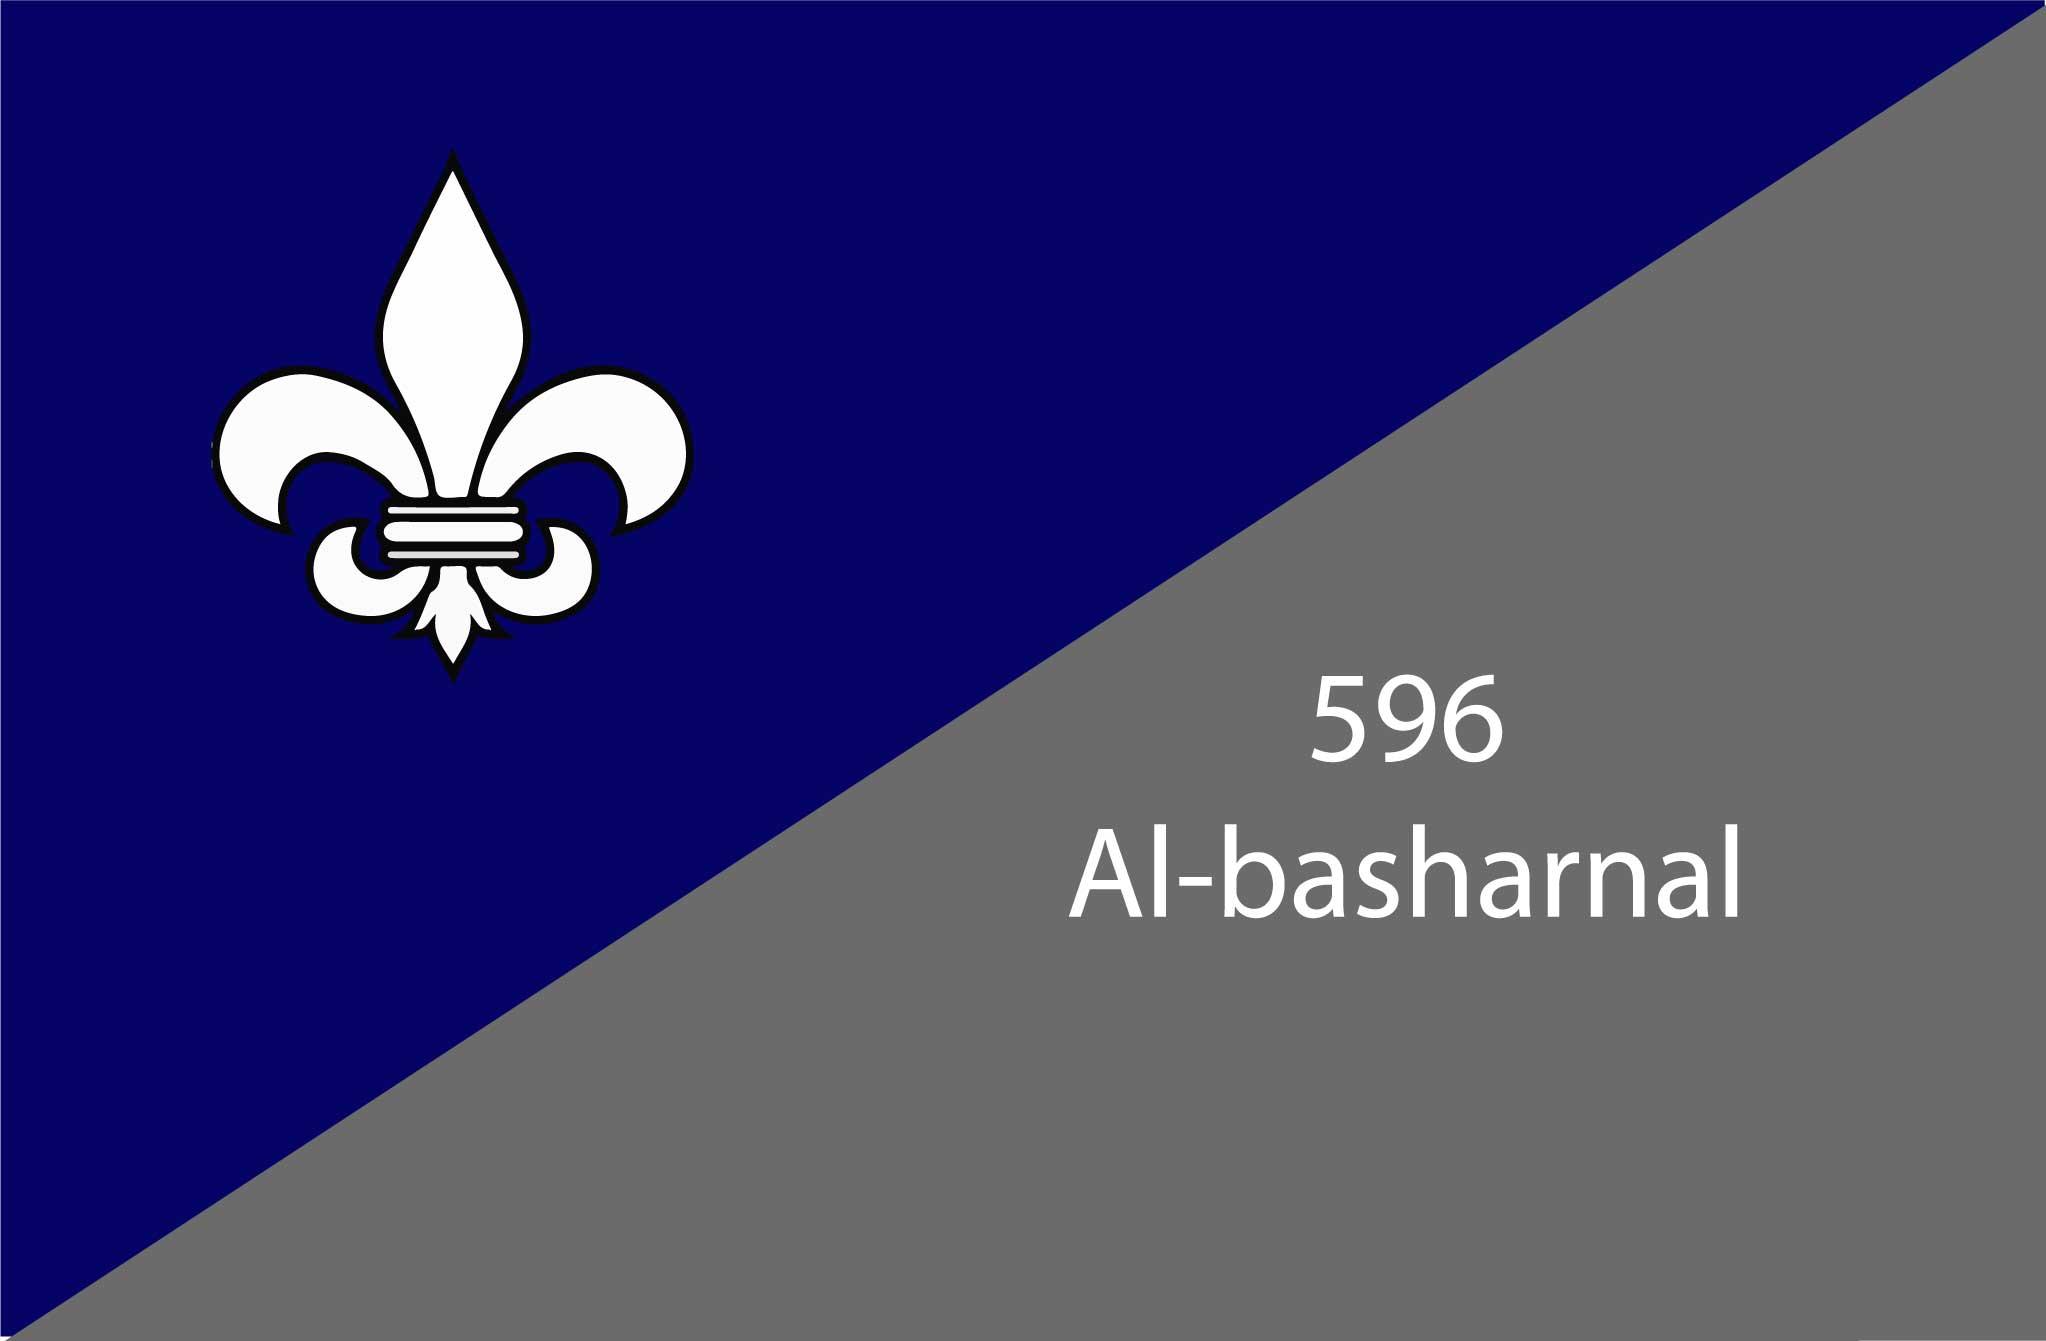 Bandera Al basharnal 596